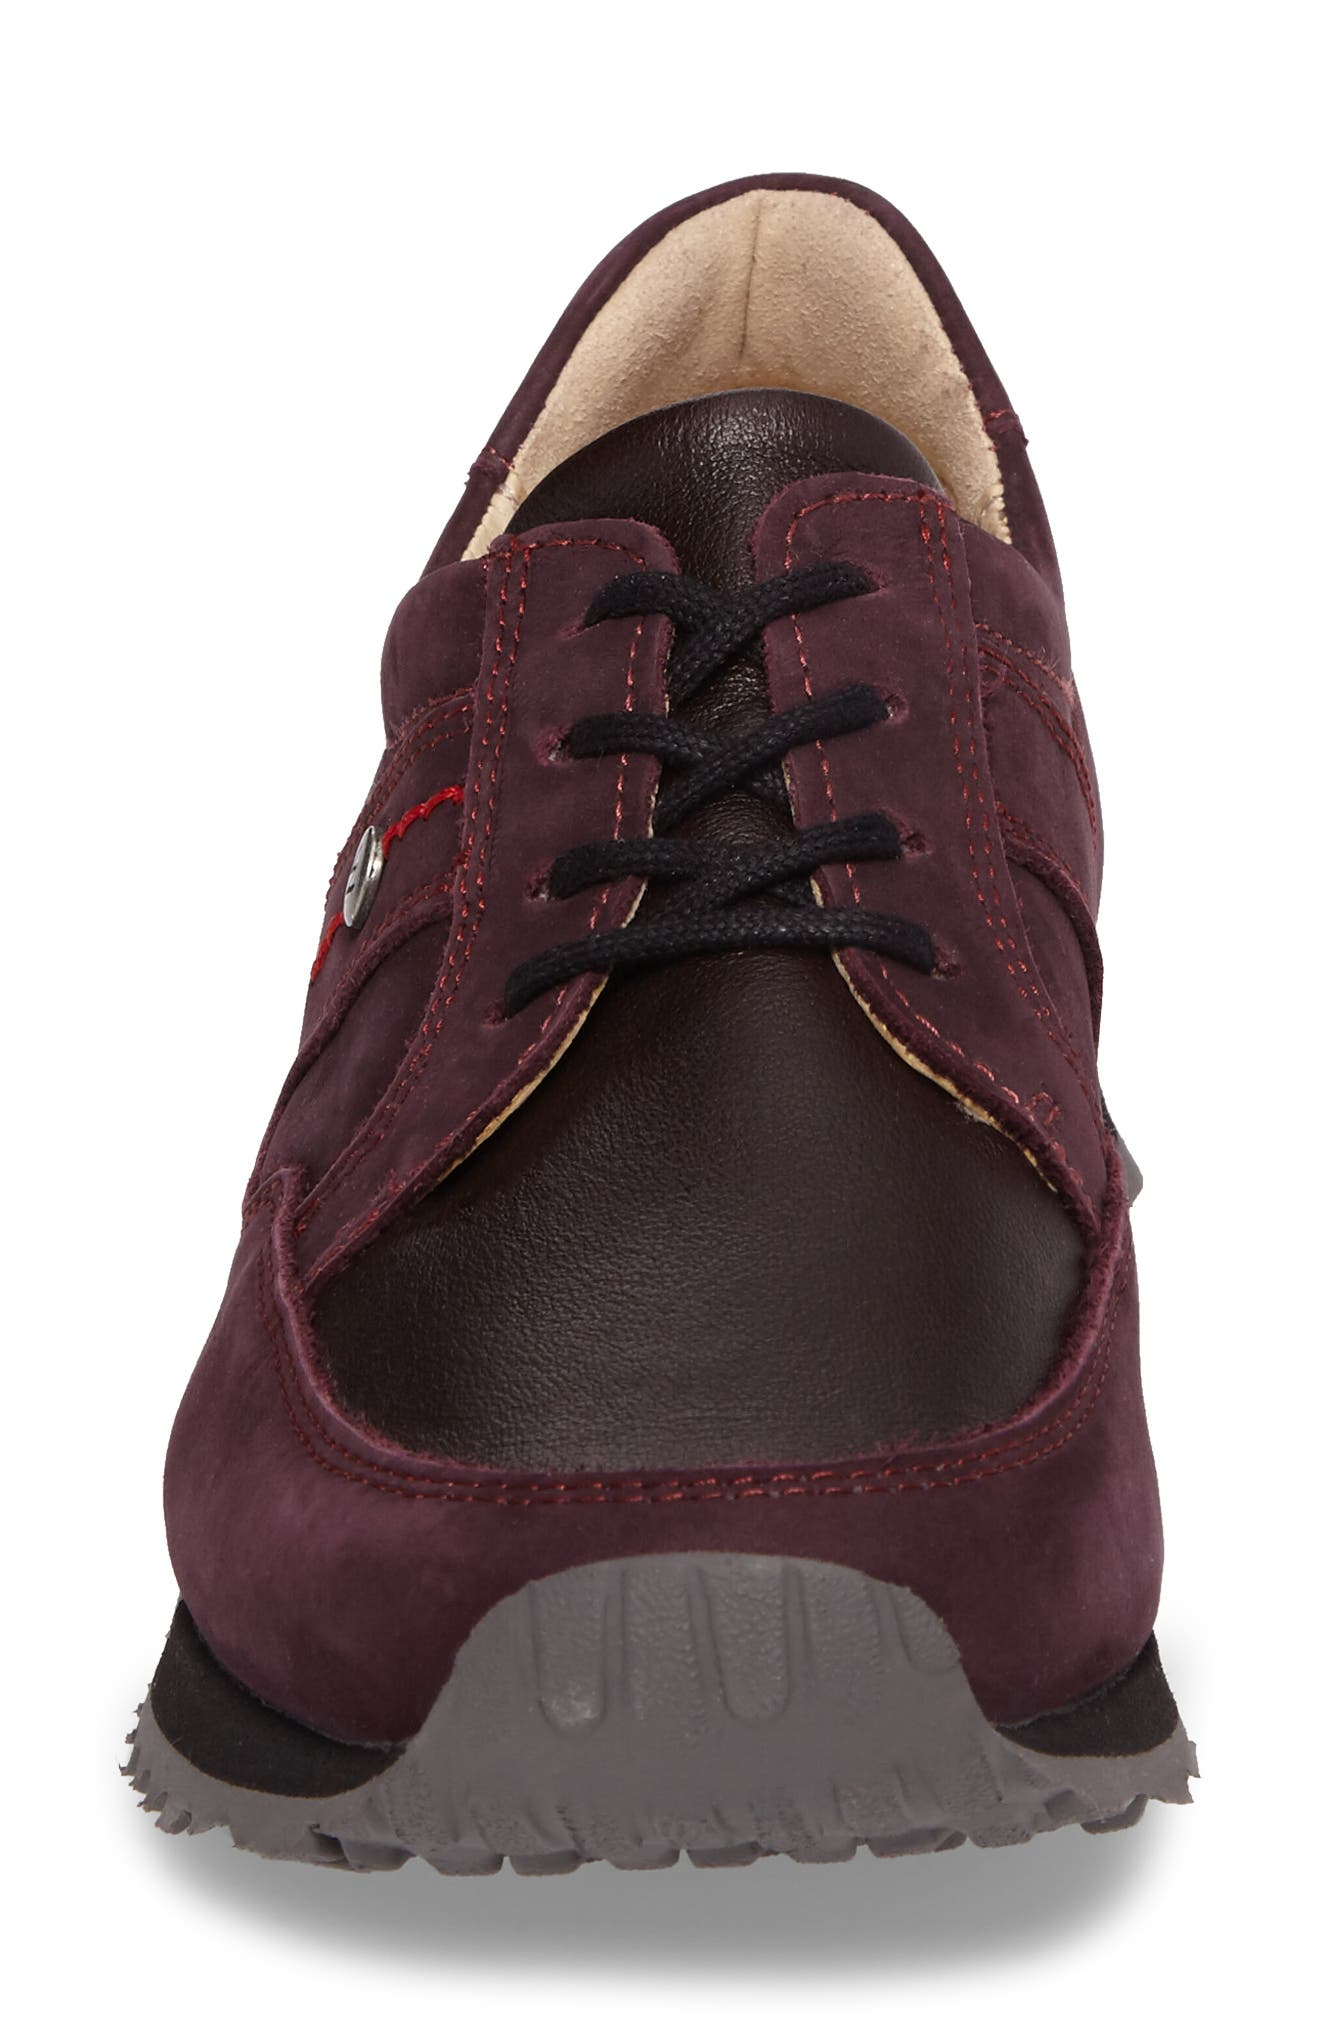 E-Walk Sneaker,                             Alternate thumbnail 4, color,                             BORDO LEATHER